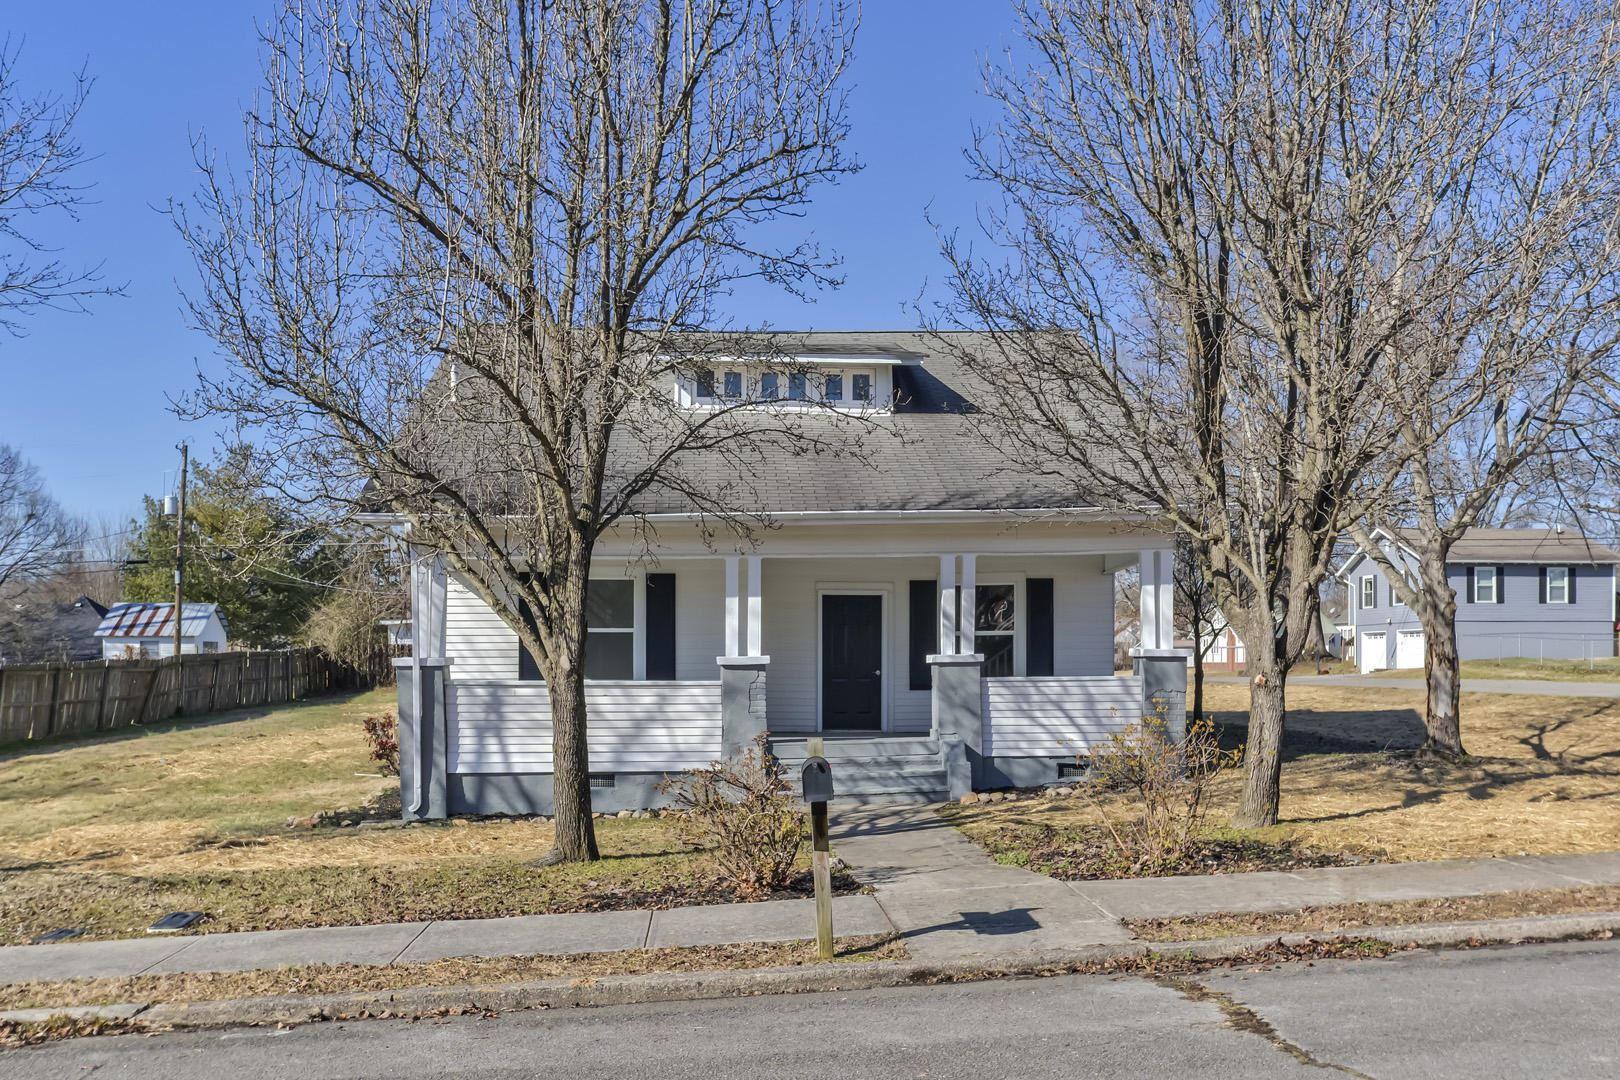 Photo of 1000 Washington Ave, Etowah, TN 37331 (MLS # 1140179)